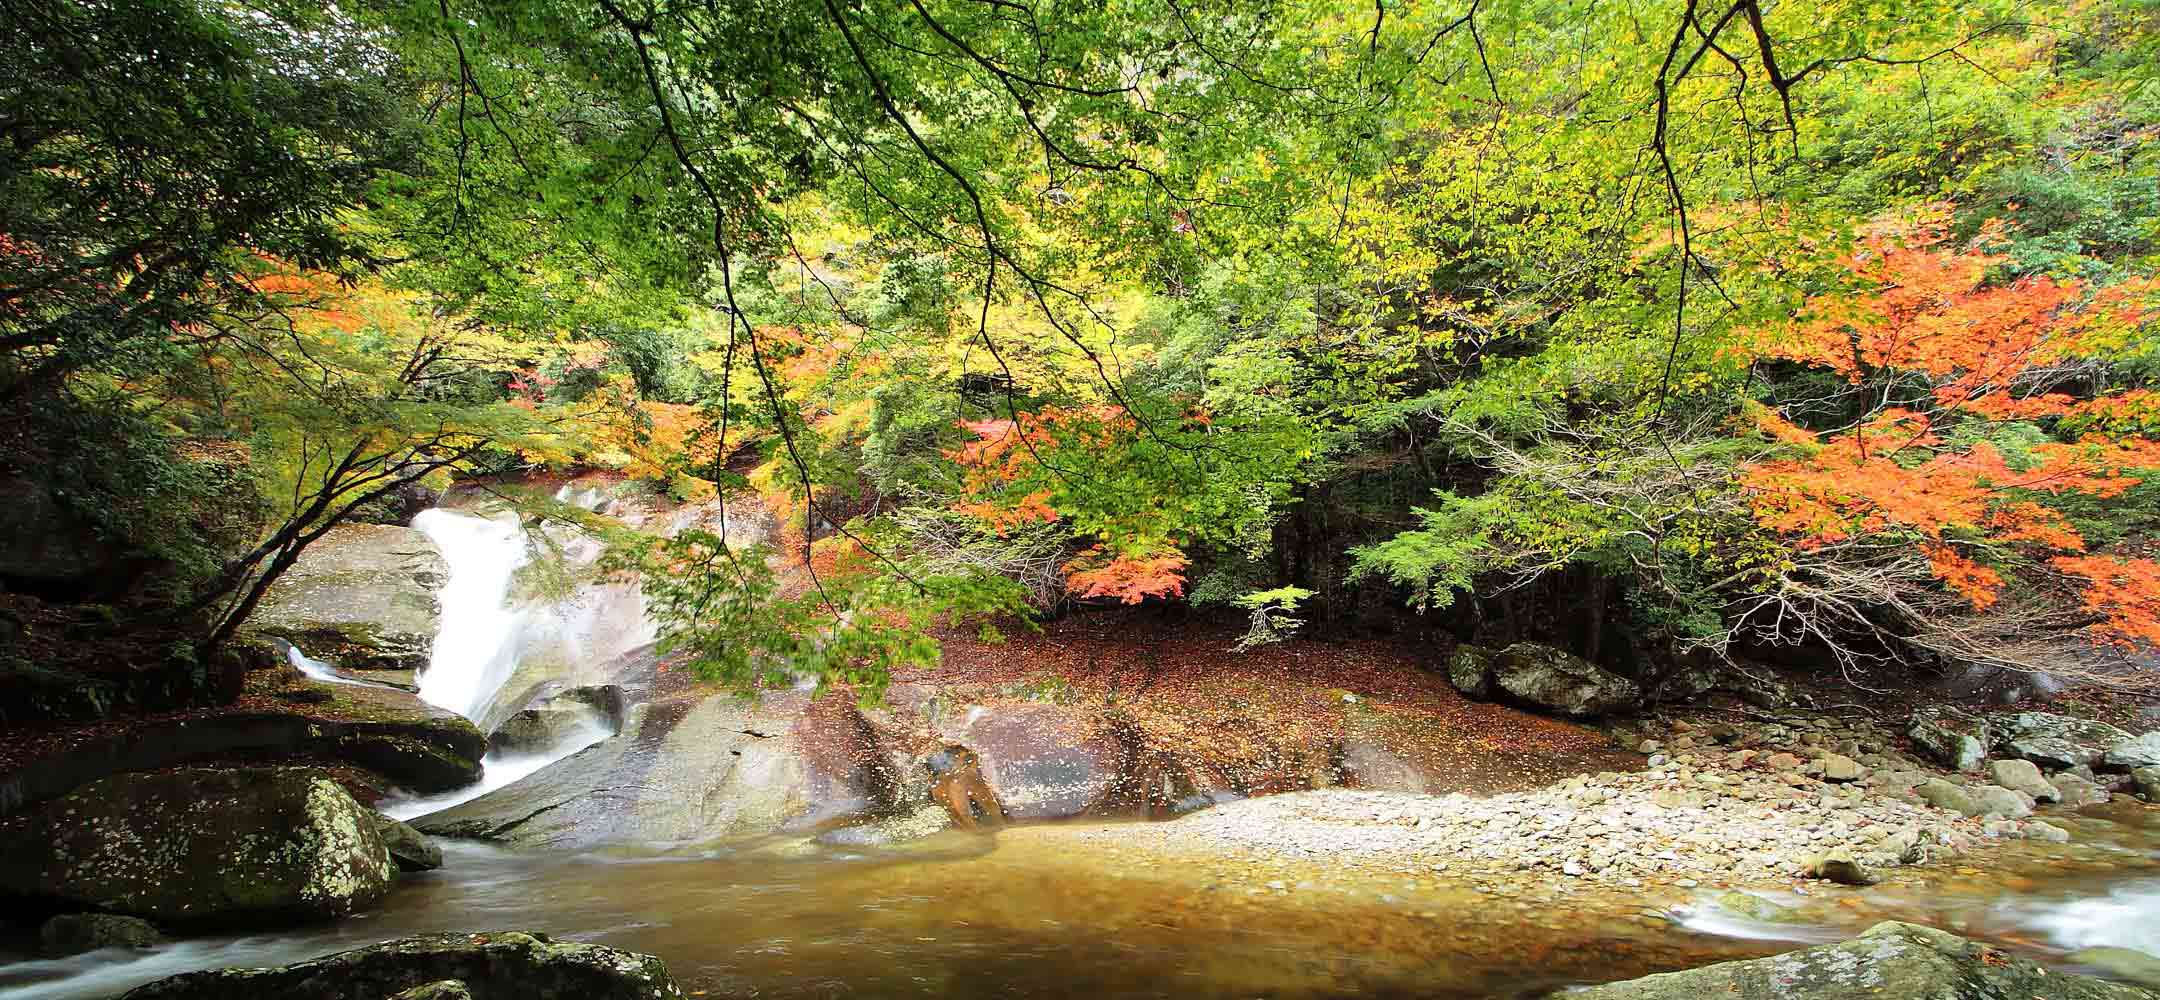 Kochi Shikoku Inside Japan Tours